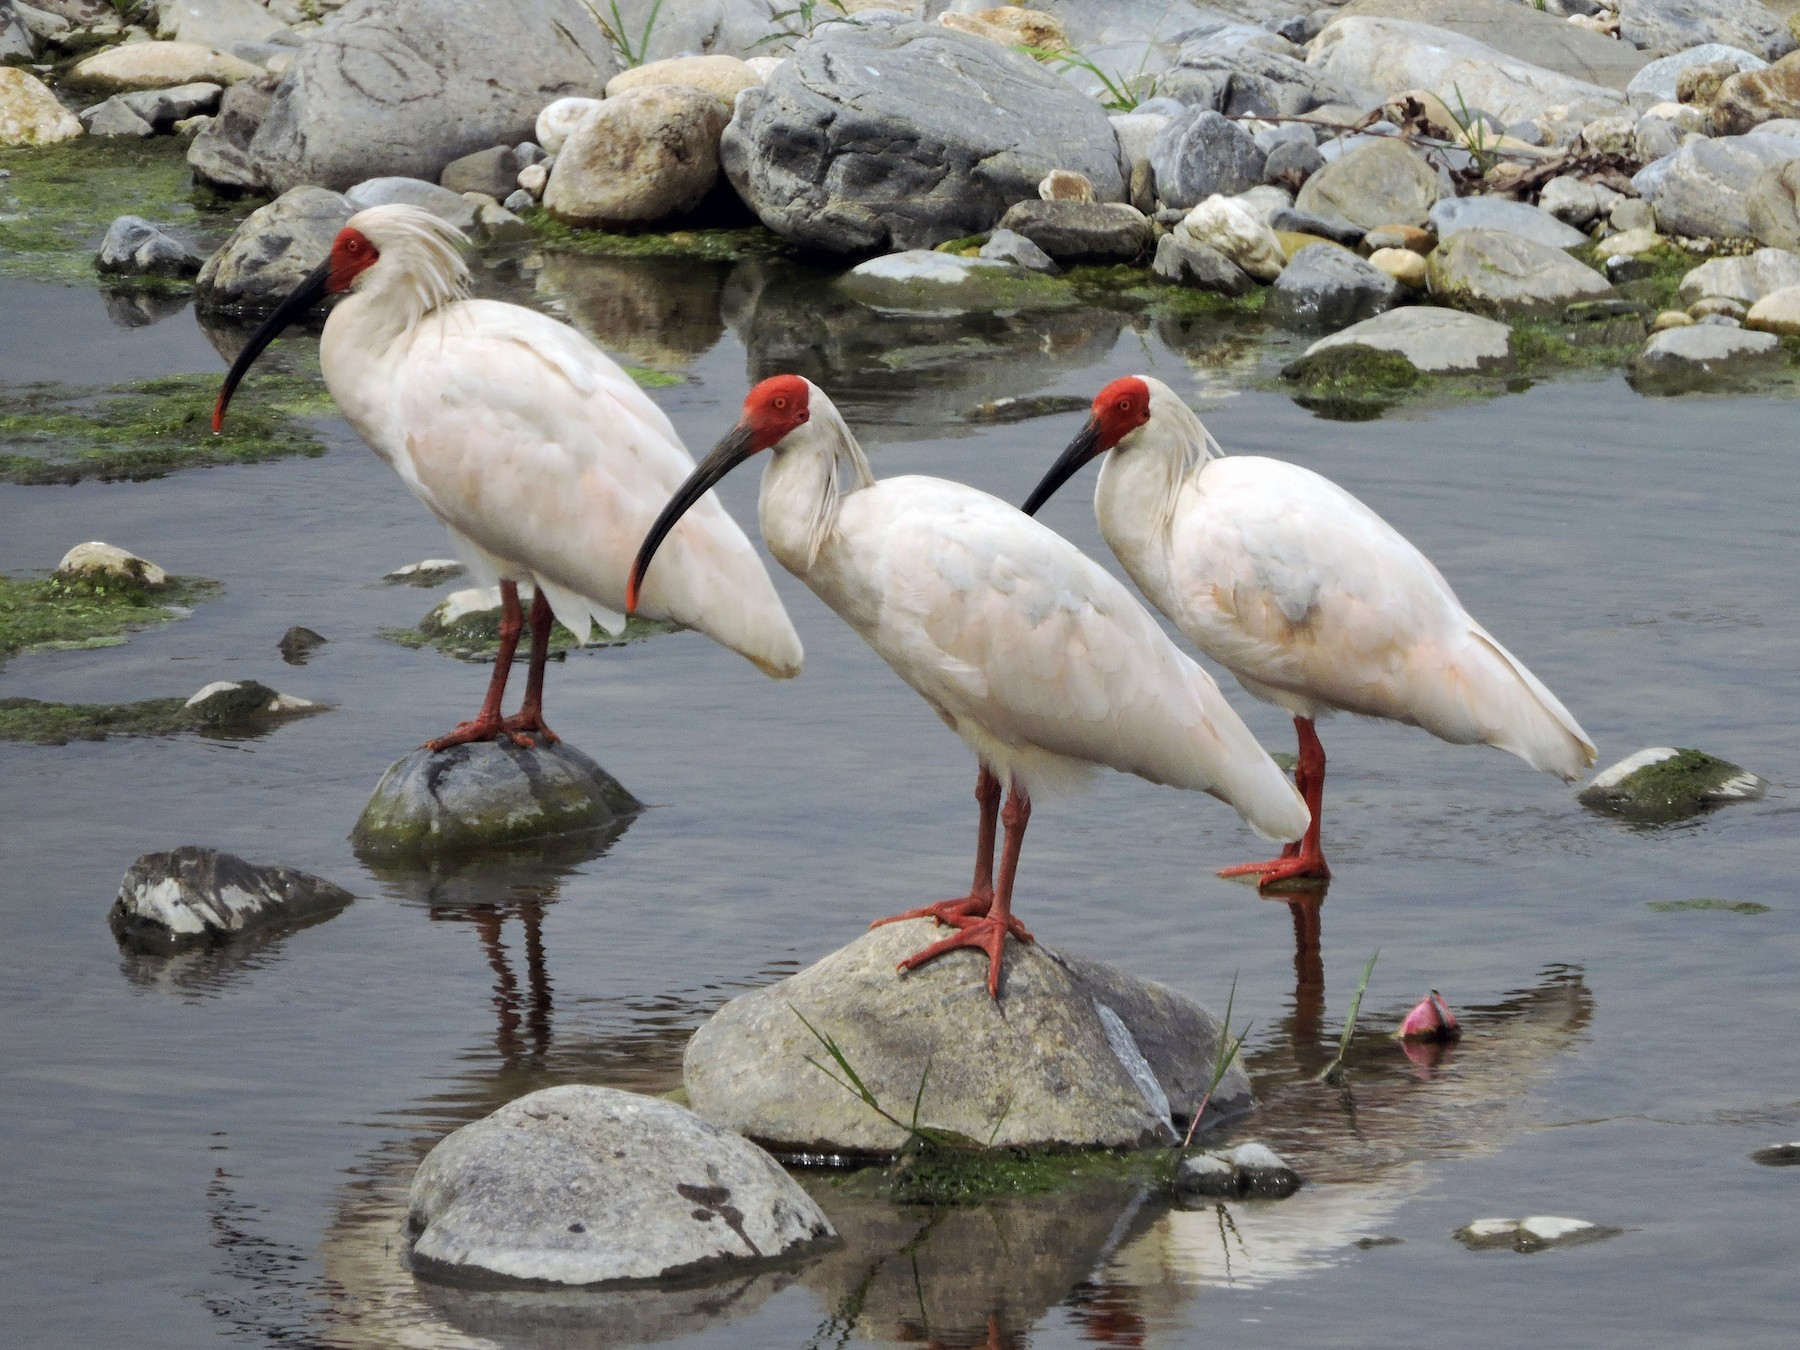 Crested Ibis - Mark w11 Kulstad